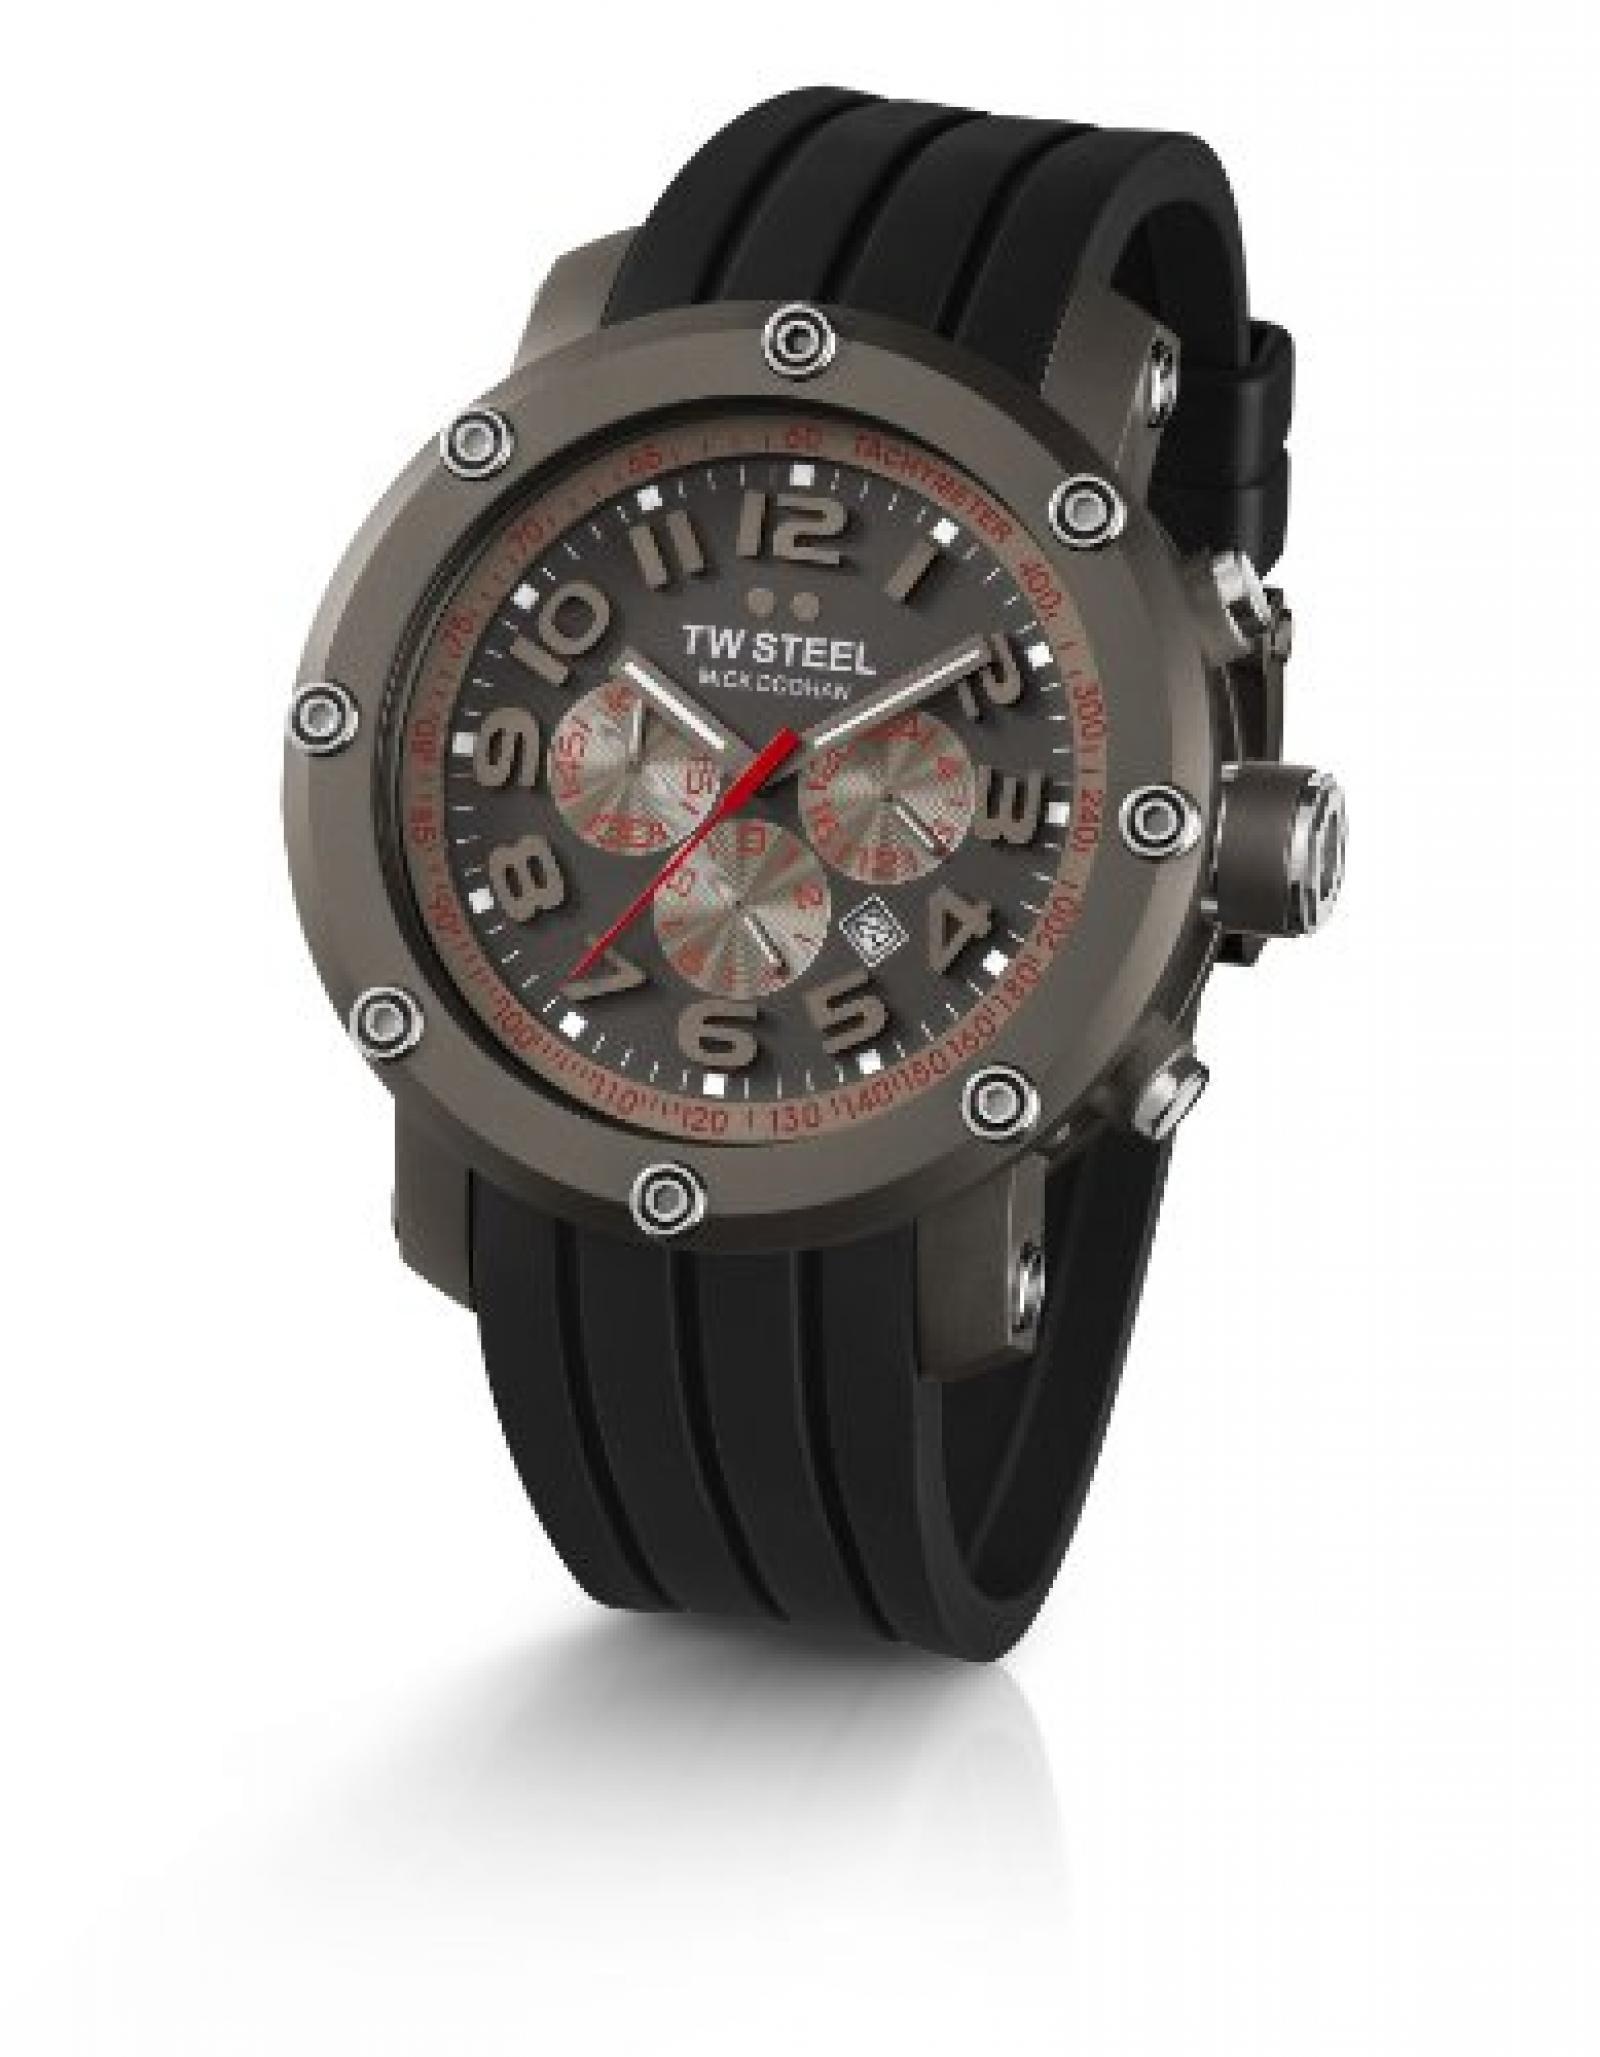 TW Steel Sonder-Edition Herren-Armbanduhr XL Grandeur Tech Chronograph Silikon TW-613